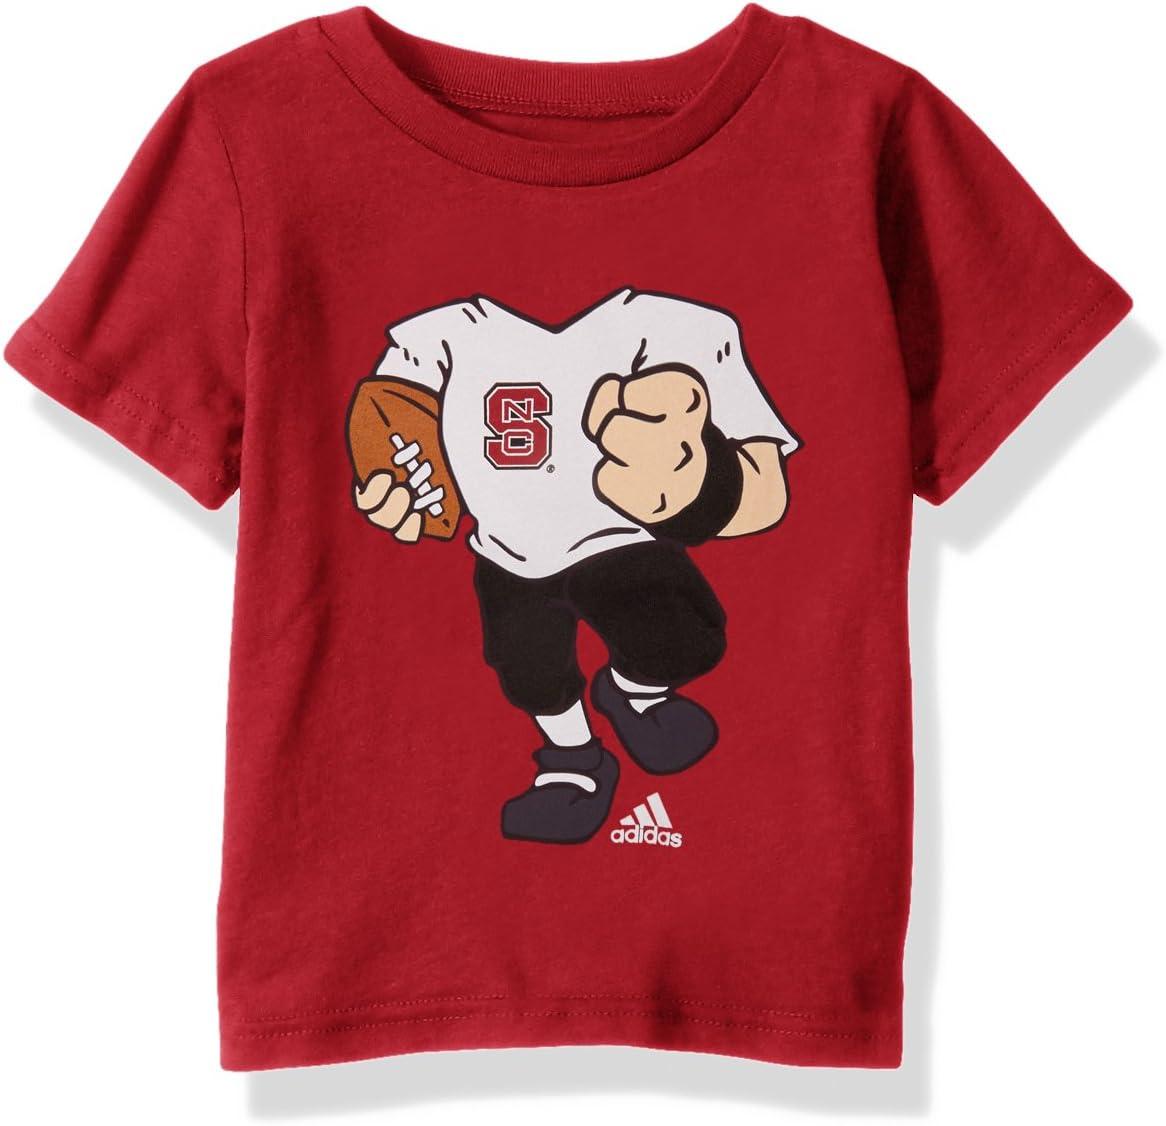 Outerstuff NCAA Unisex-Baby Football Dreams Short Sleeve Tee